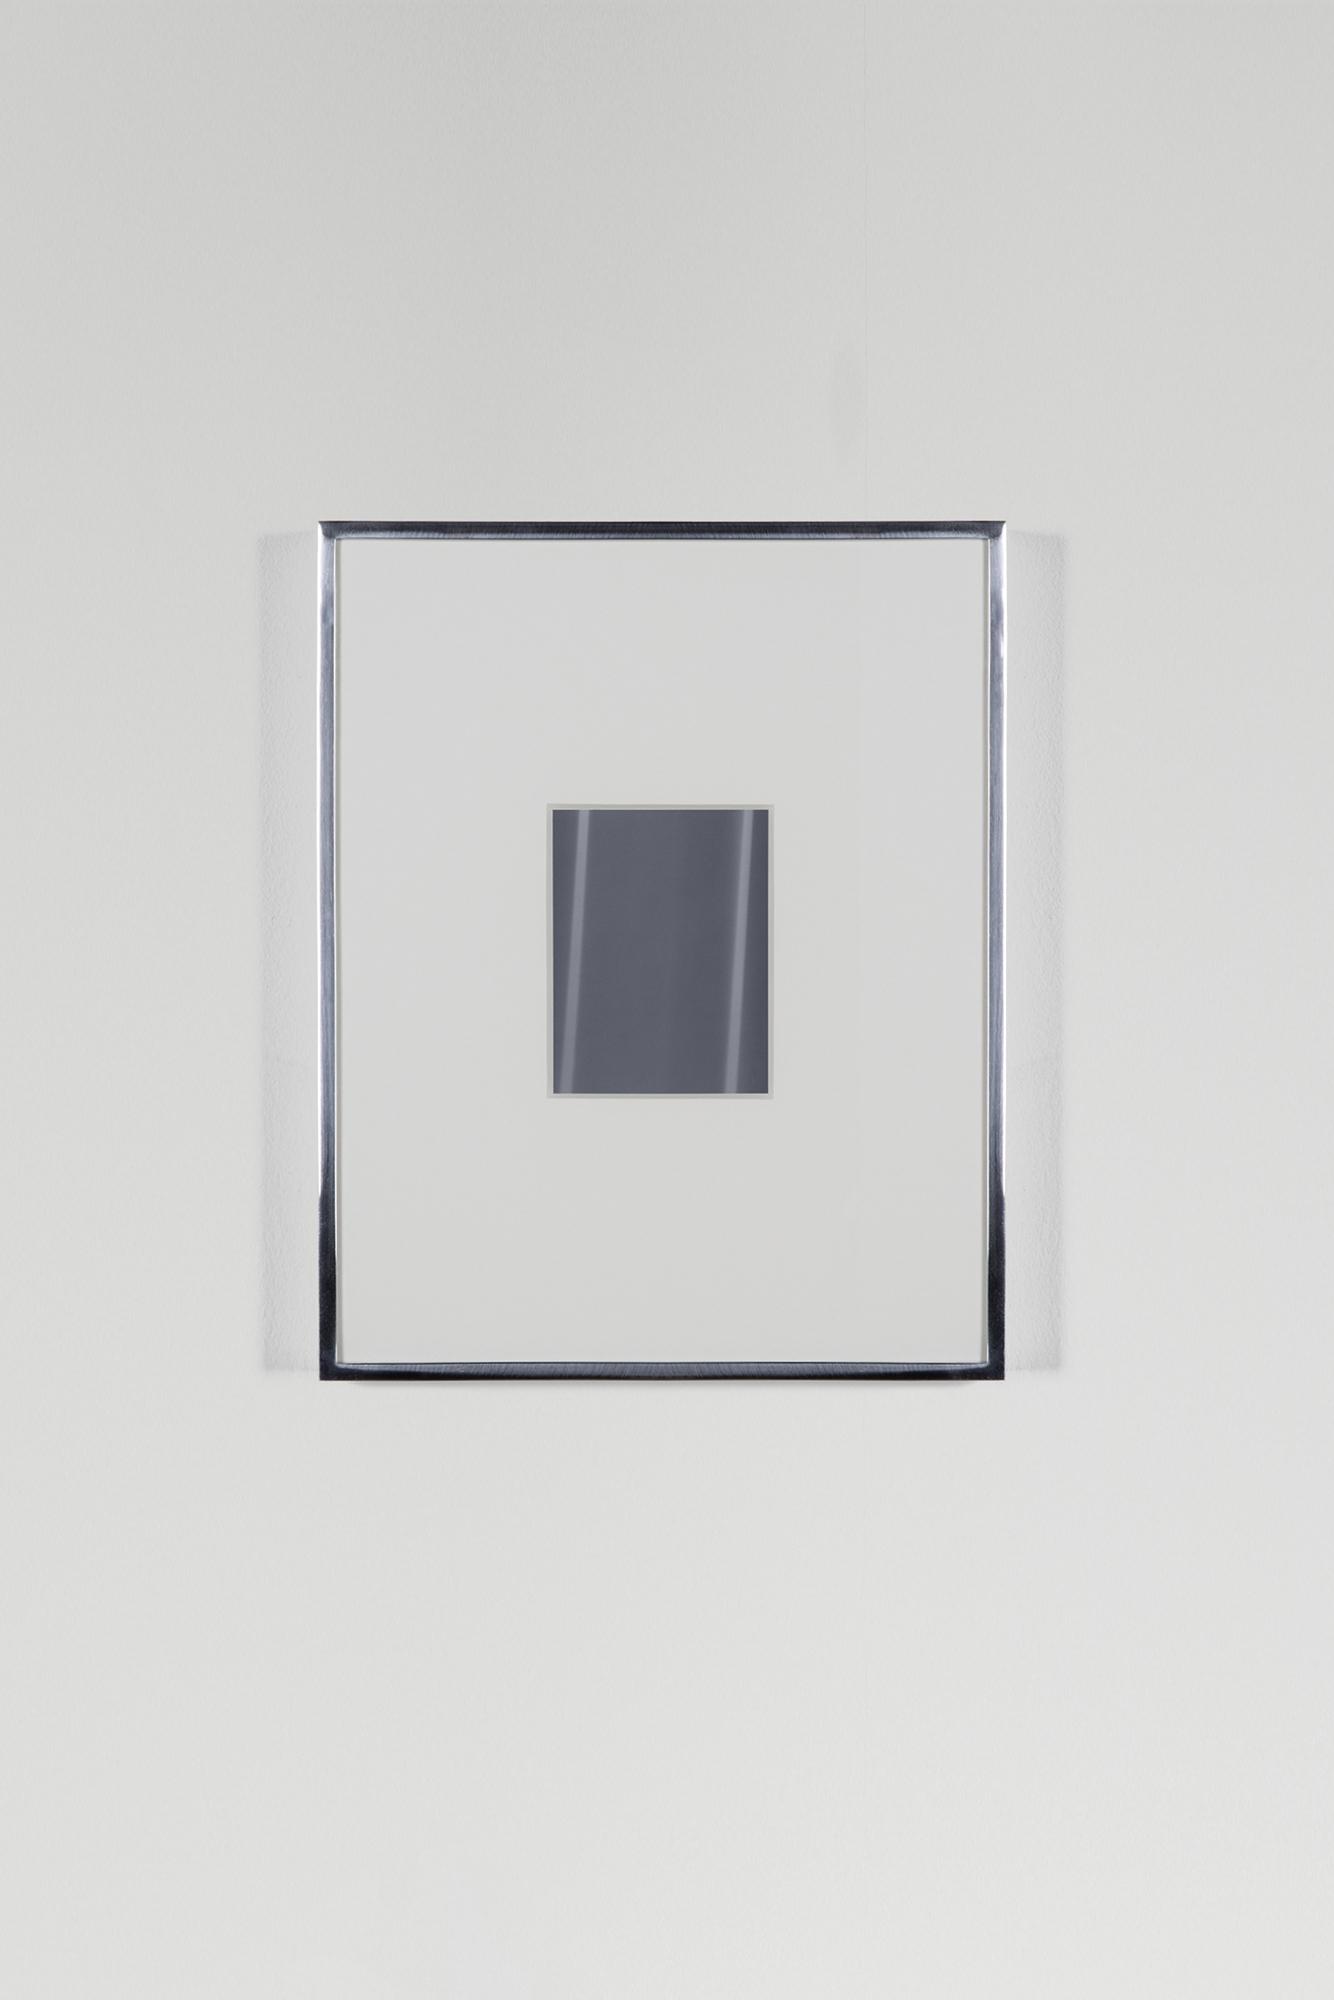 Transparency (Negative) [Kodak Portra 400NC Em. No. 1022: June 5–15, 2015 LAX/JFK EWR/LHR LHR/LAX]    2017   Epson Ultrachrome K3 archival ink jet print on Museo Silver Rag Paper  14 x 11 inches   Transparencies, 2014–